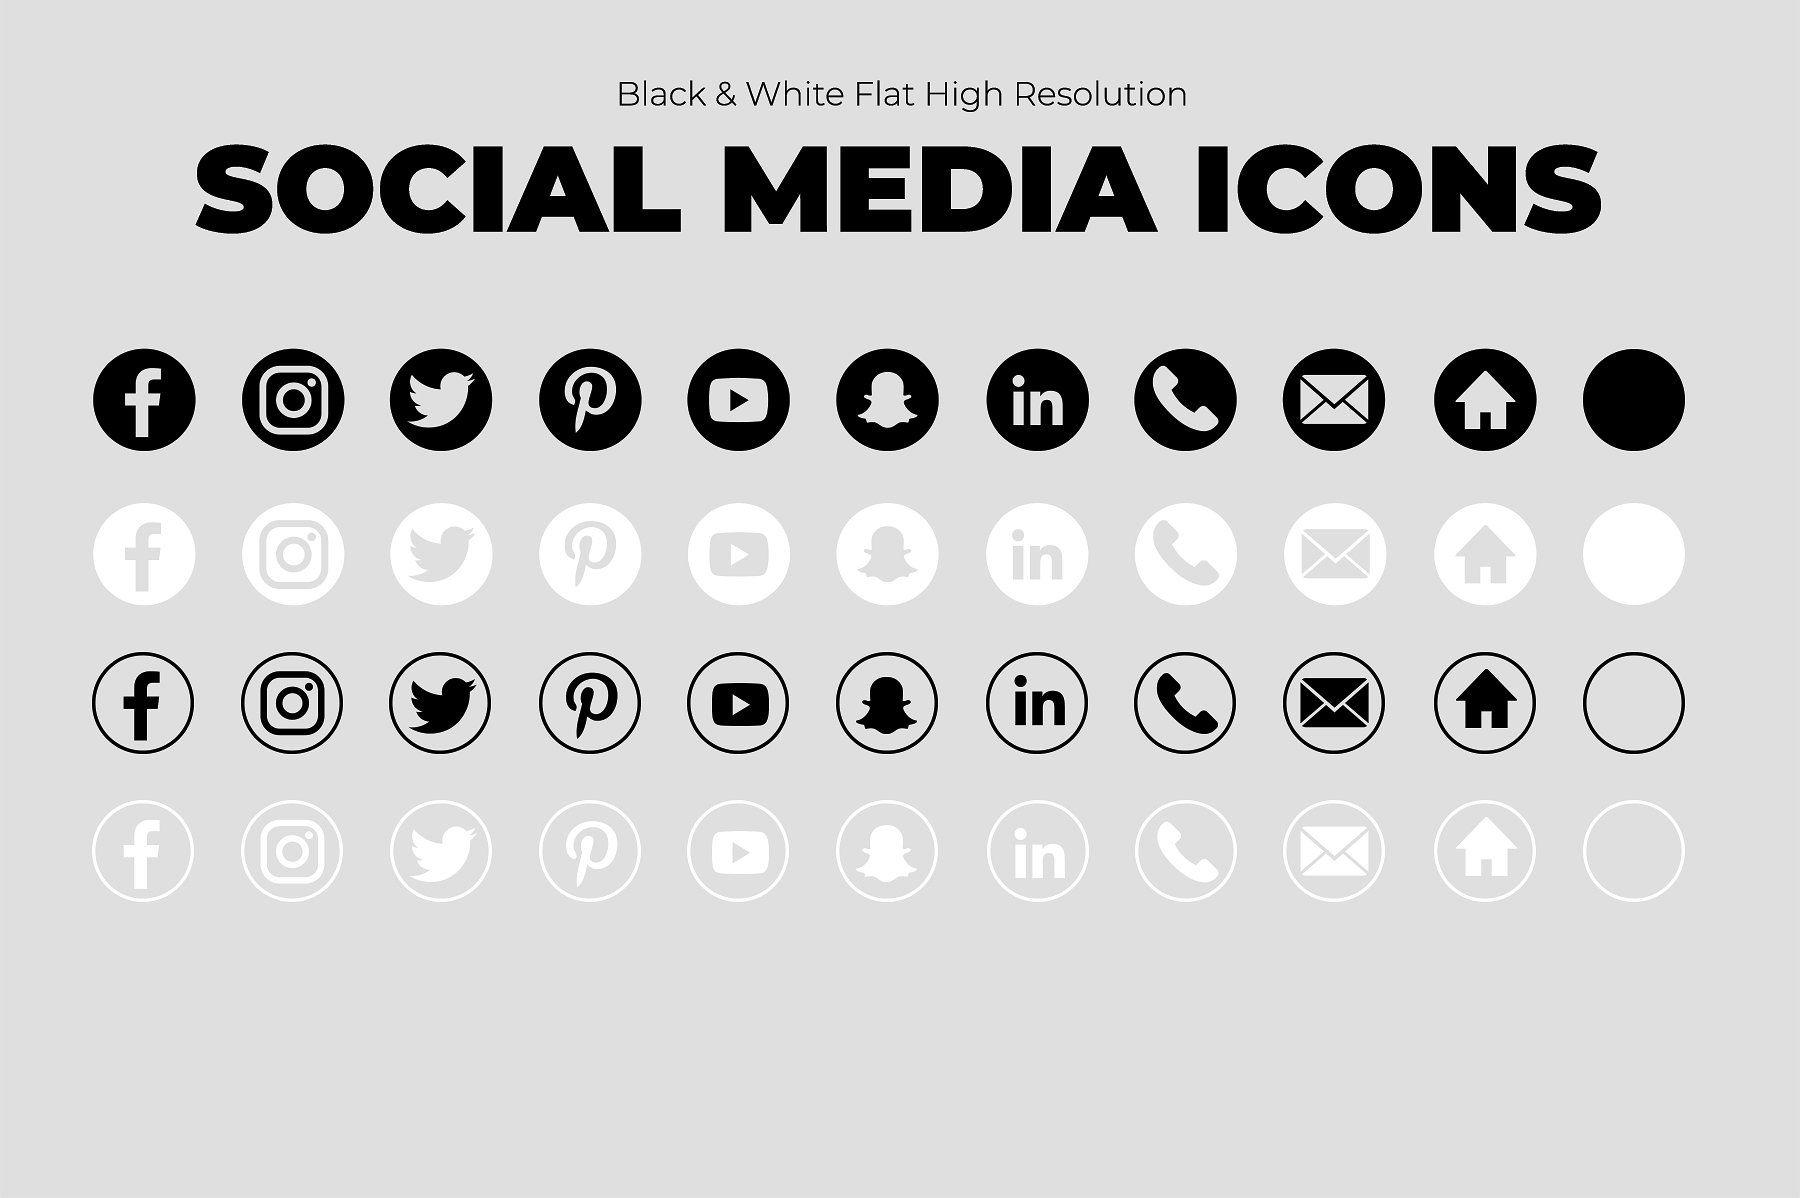 11 B&W Social Media Icons Social media icons, Social